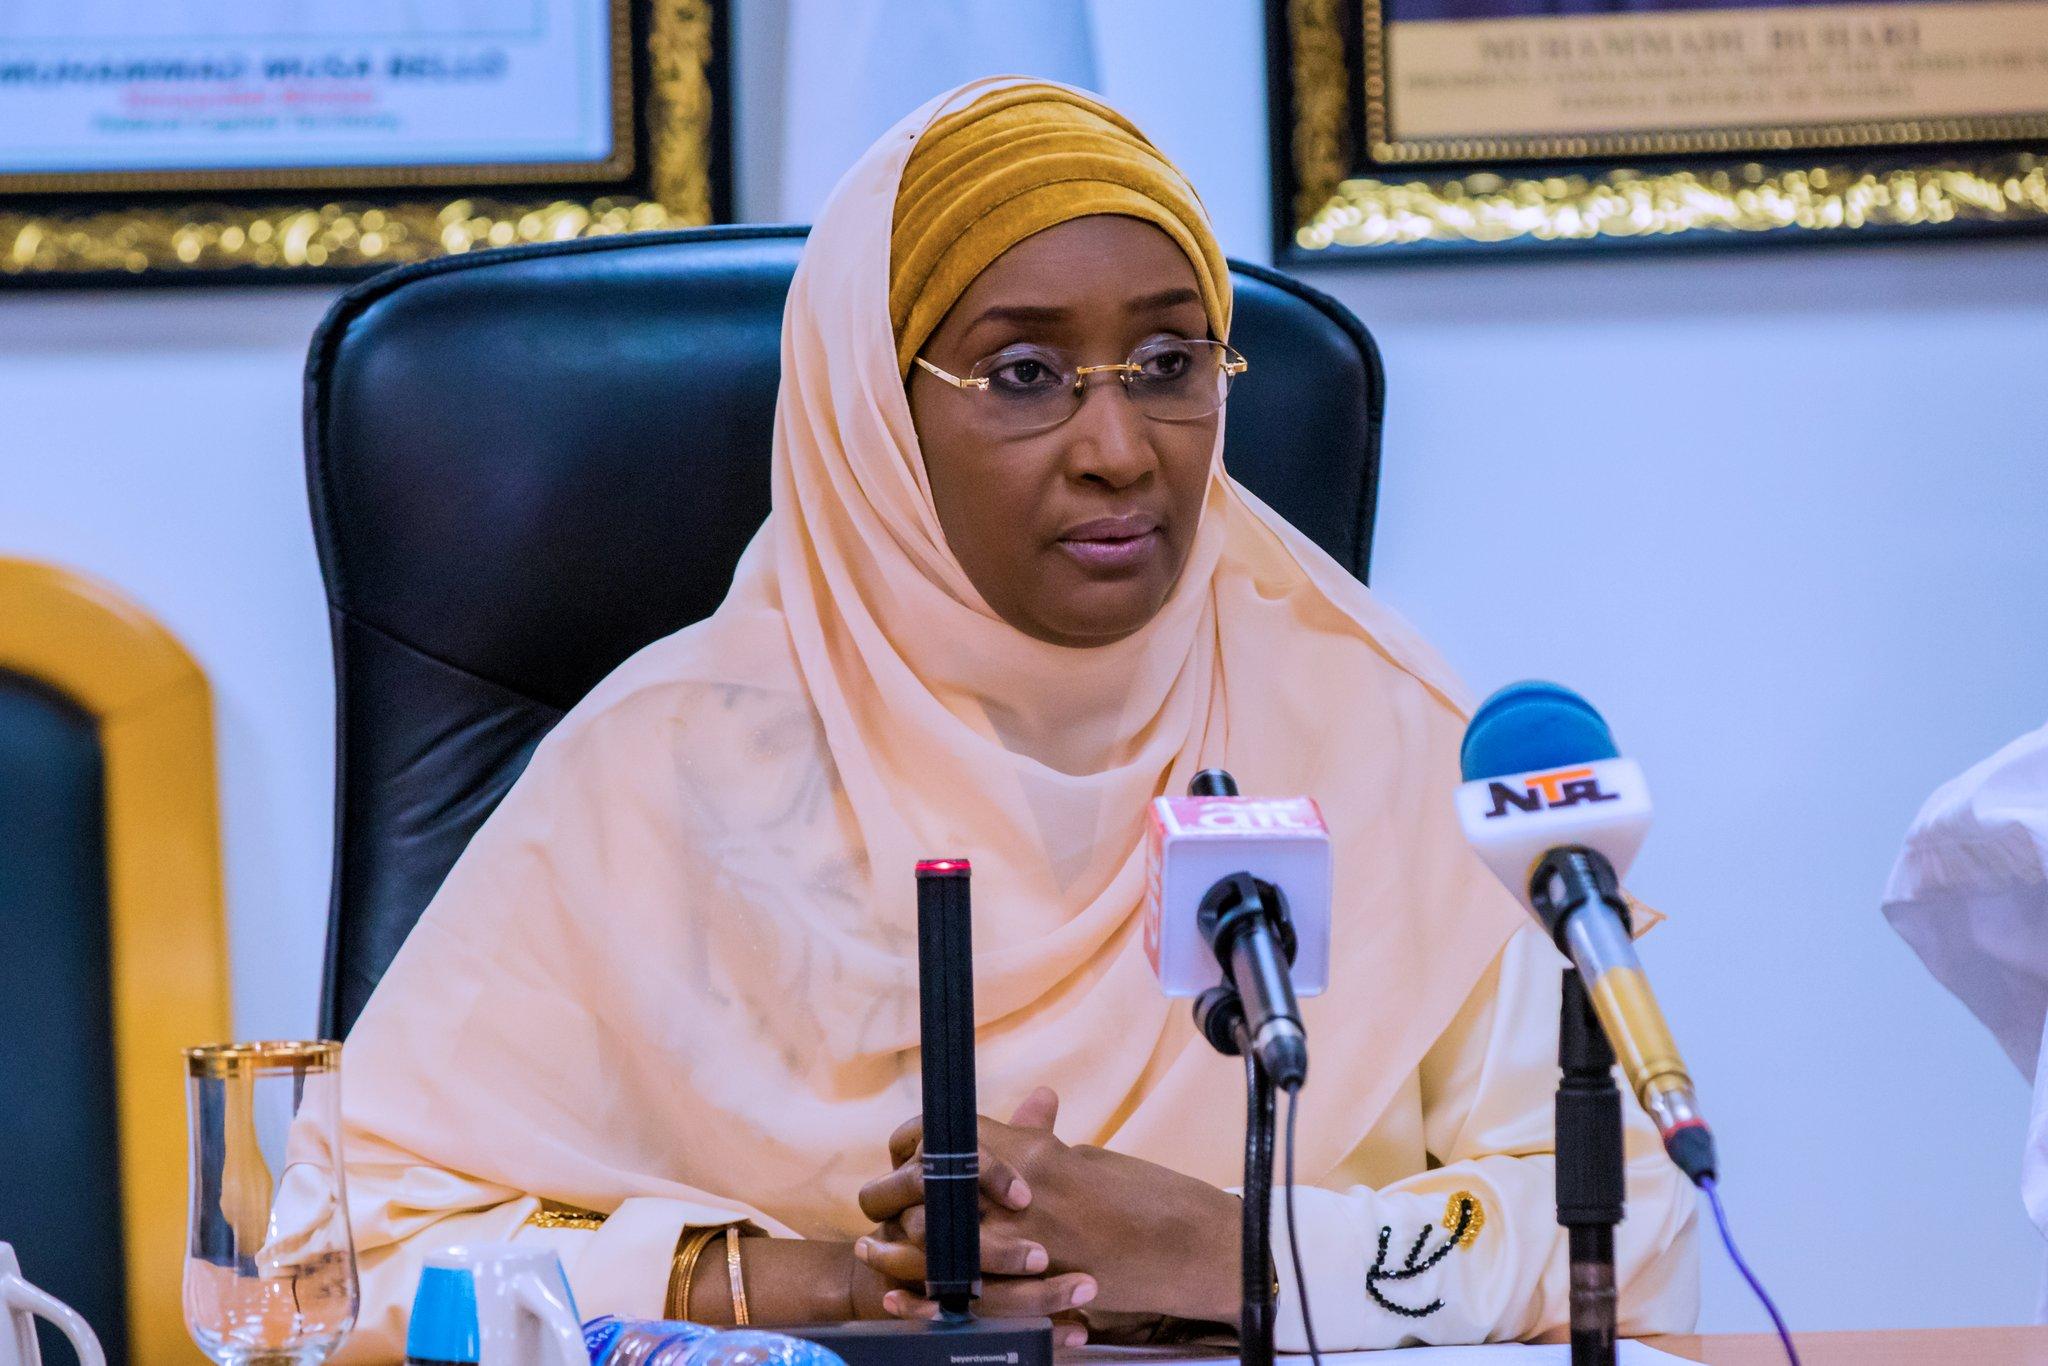 FG will address plight of poor, vulnerable Nigerians despite economic challenges – Minister